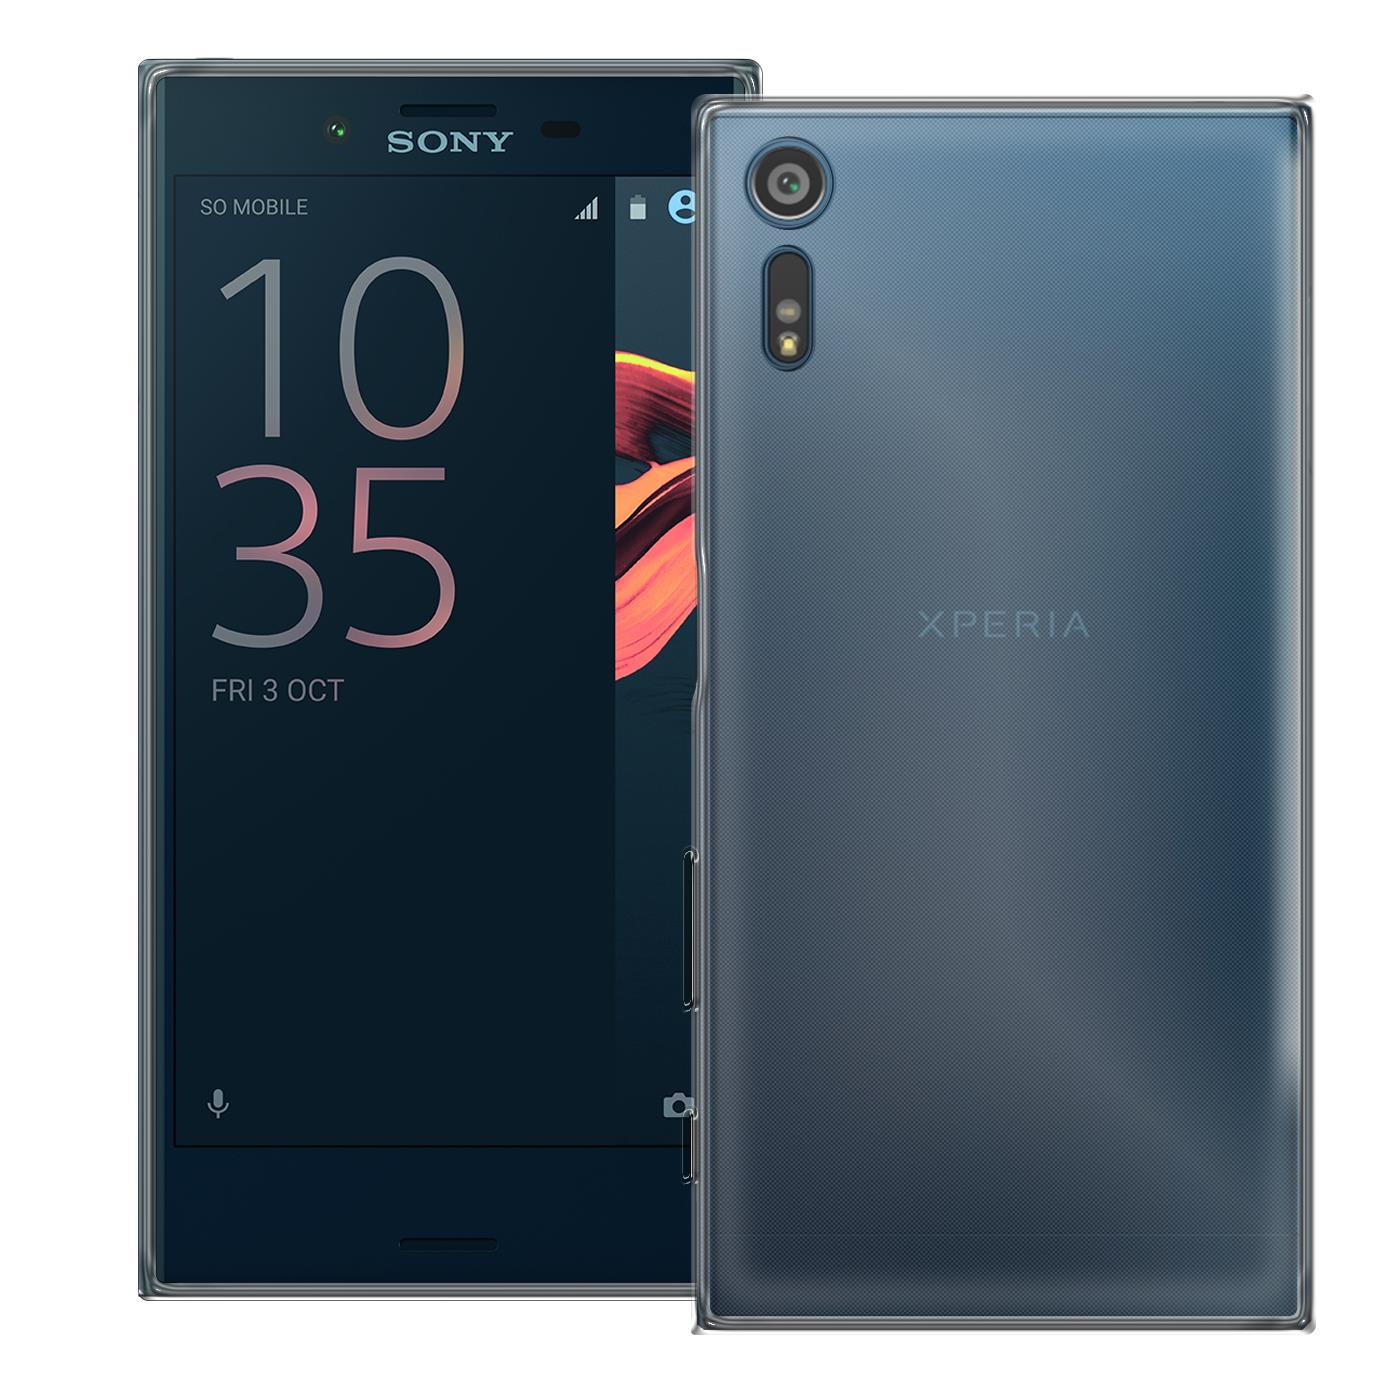 Sony-Xperia-XZ-Thin-Silikon-Klar-Case-Cover-Ultra-Slim-Stossfeste-Gel-Rueckseite Indexbild 3